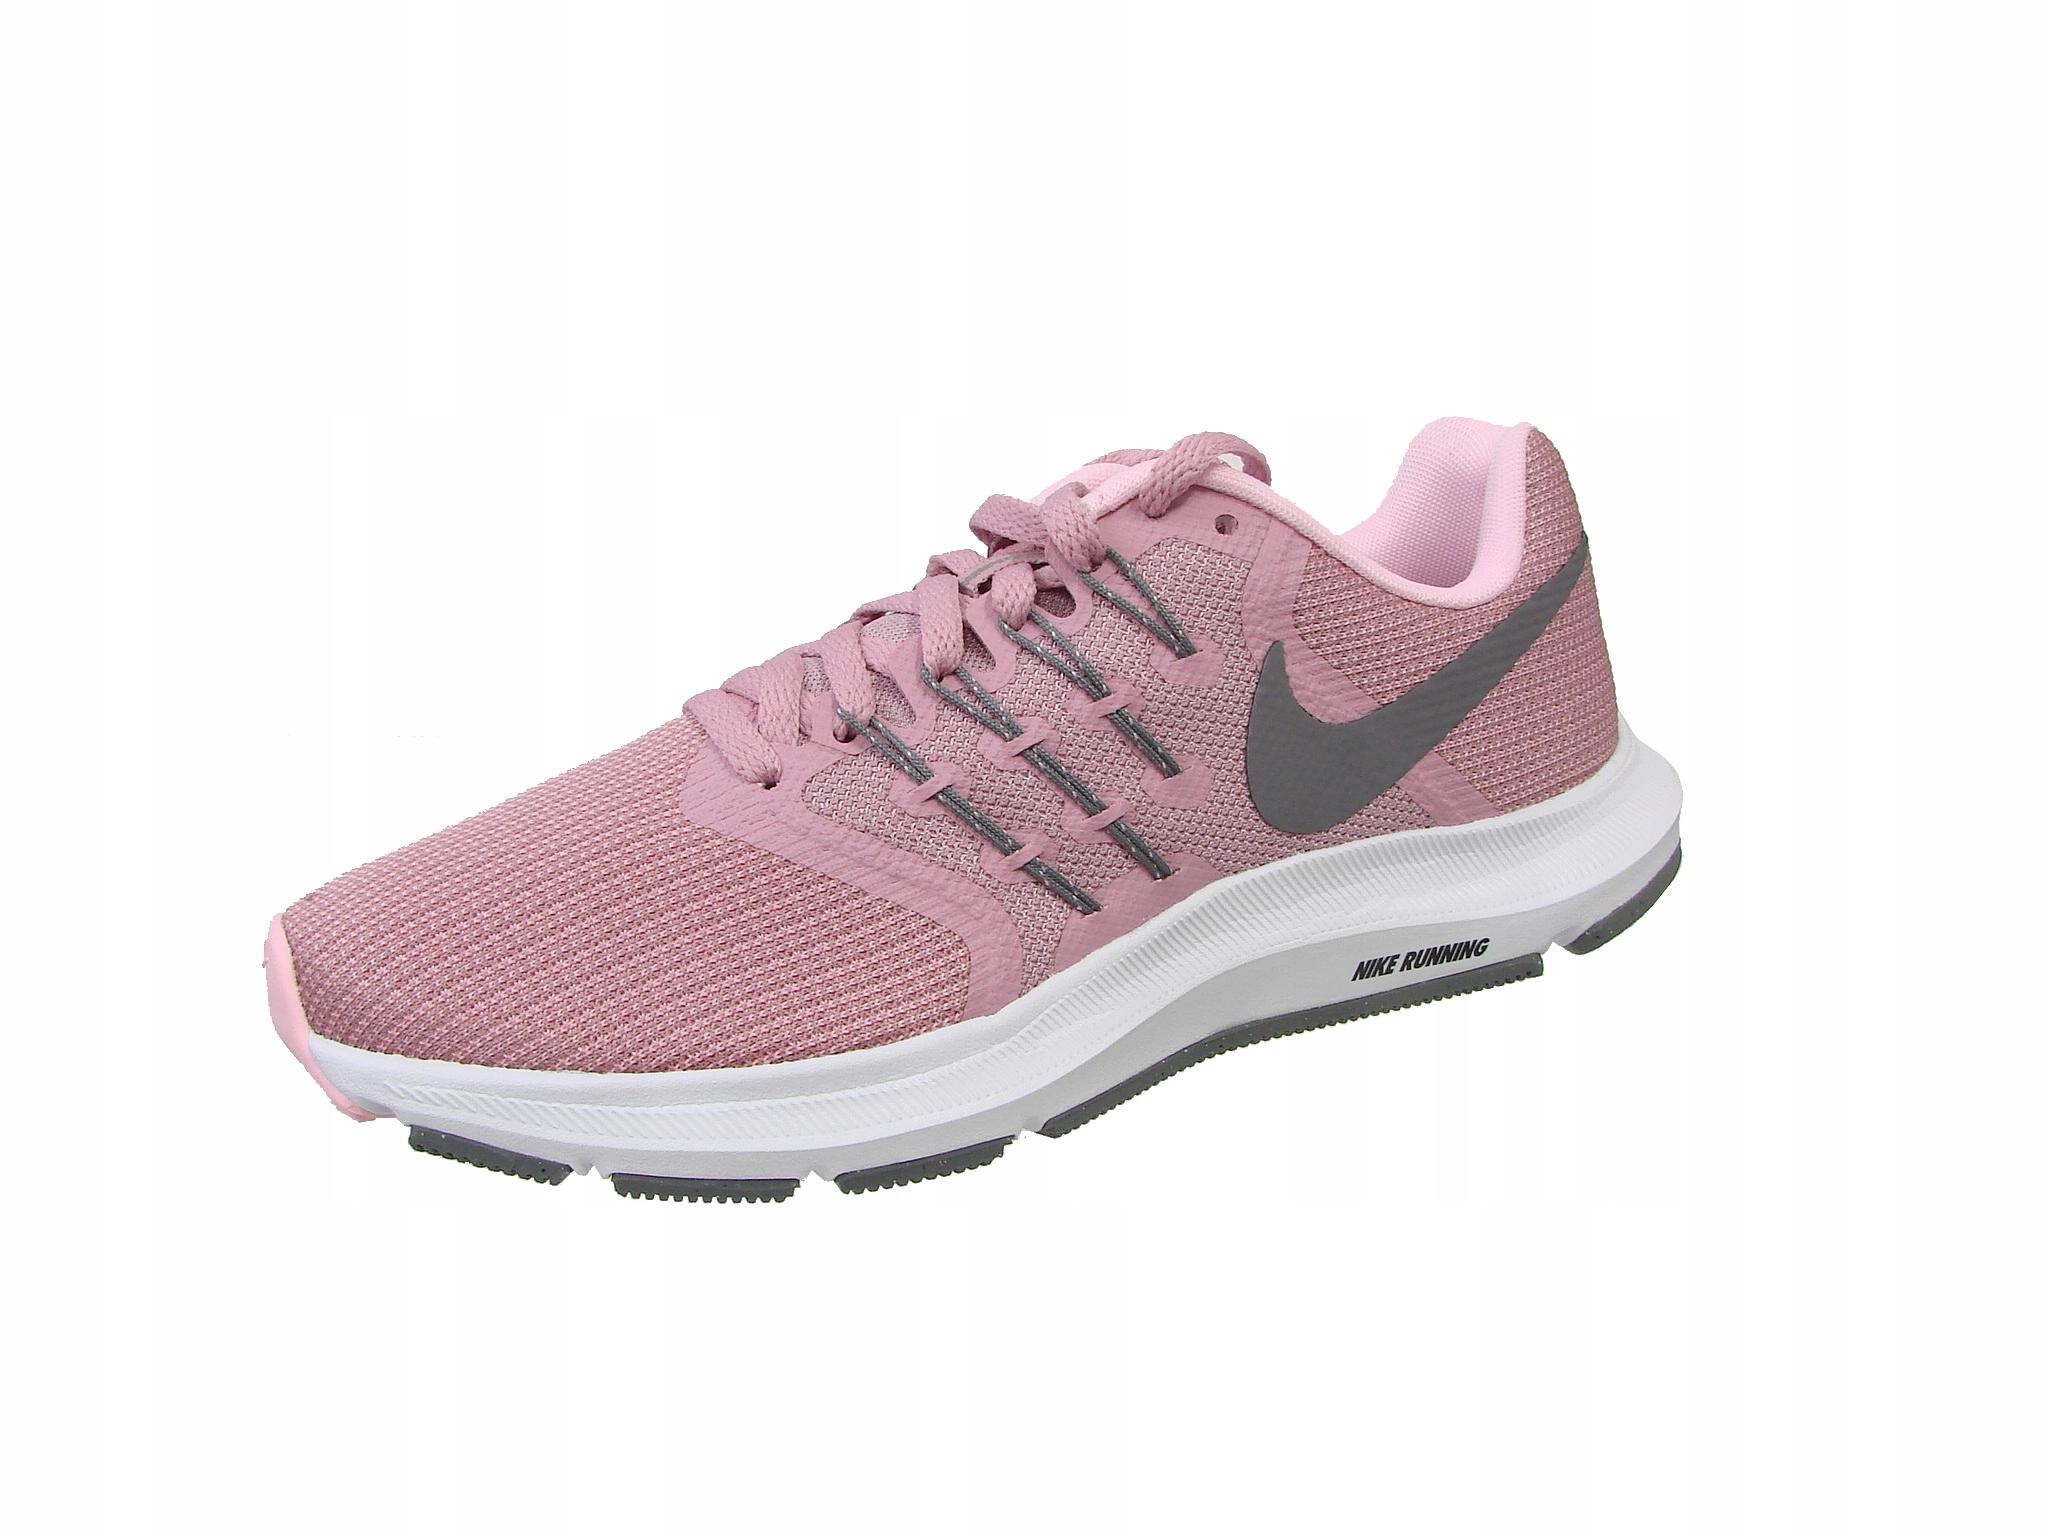 separation shoes 02115 82e2c BUTY DAMSKIE NIKE WMNS SWIFT RUN 909006-600 38,5